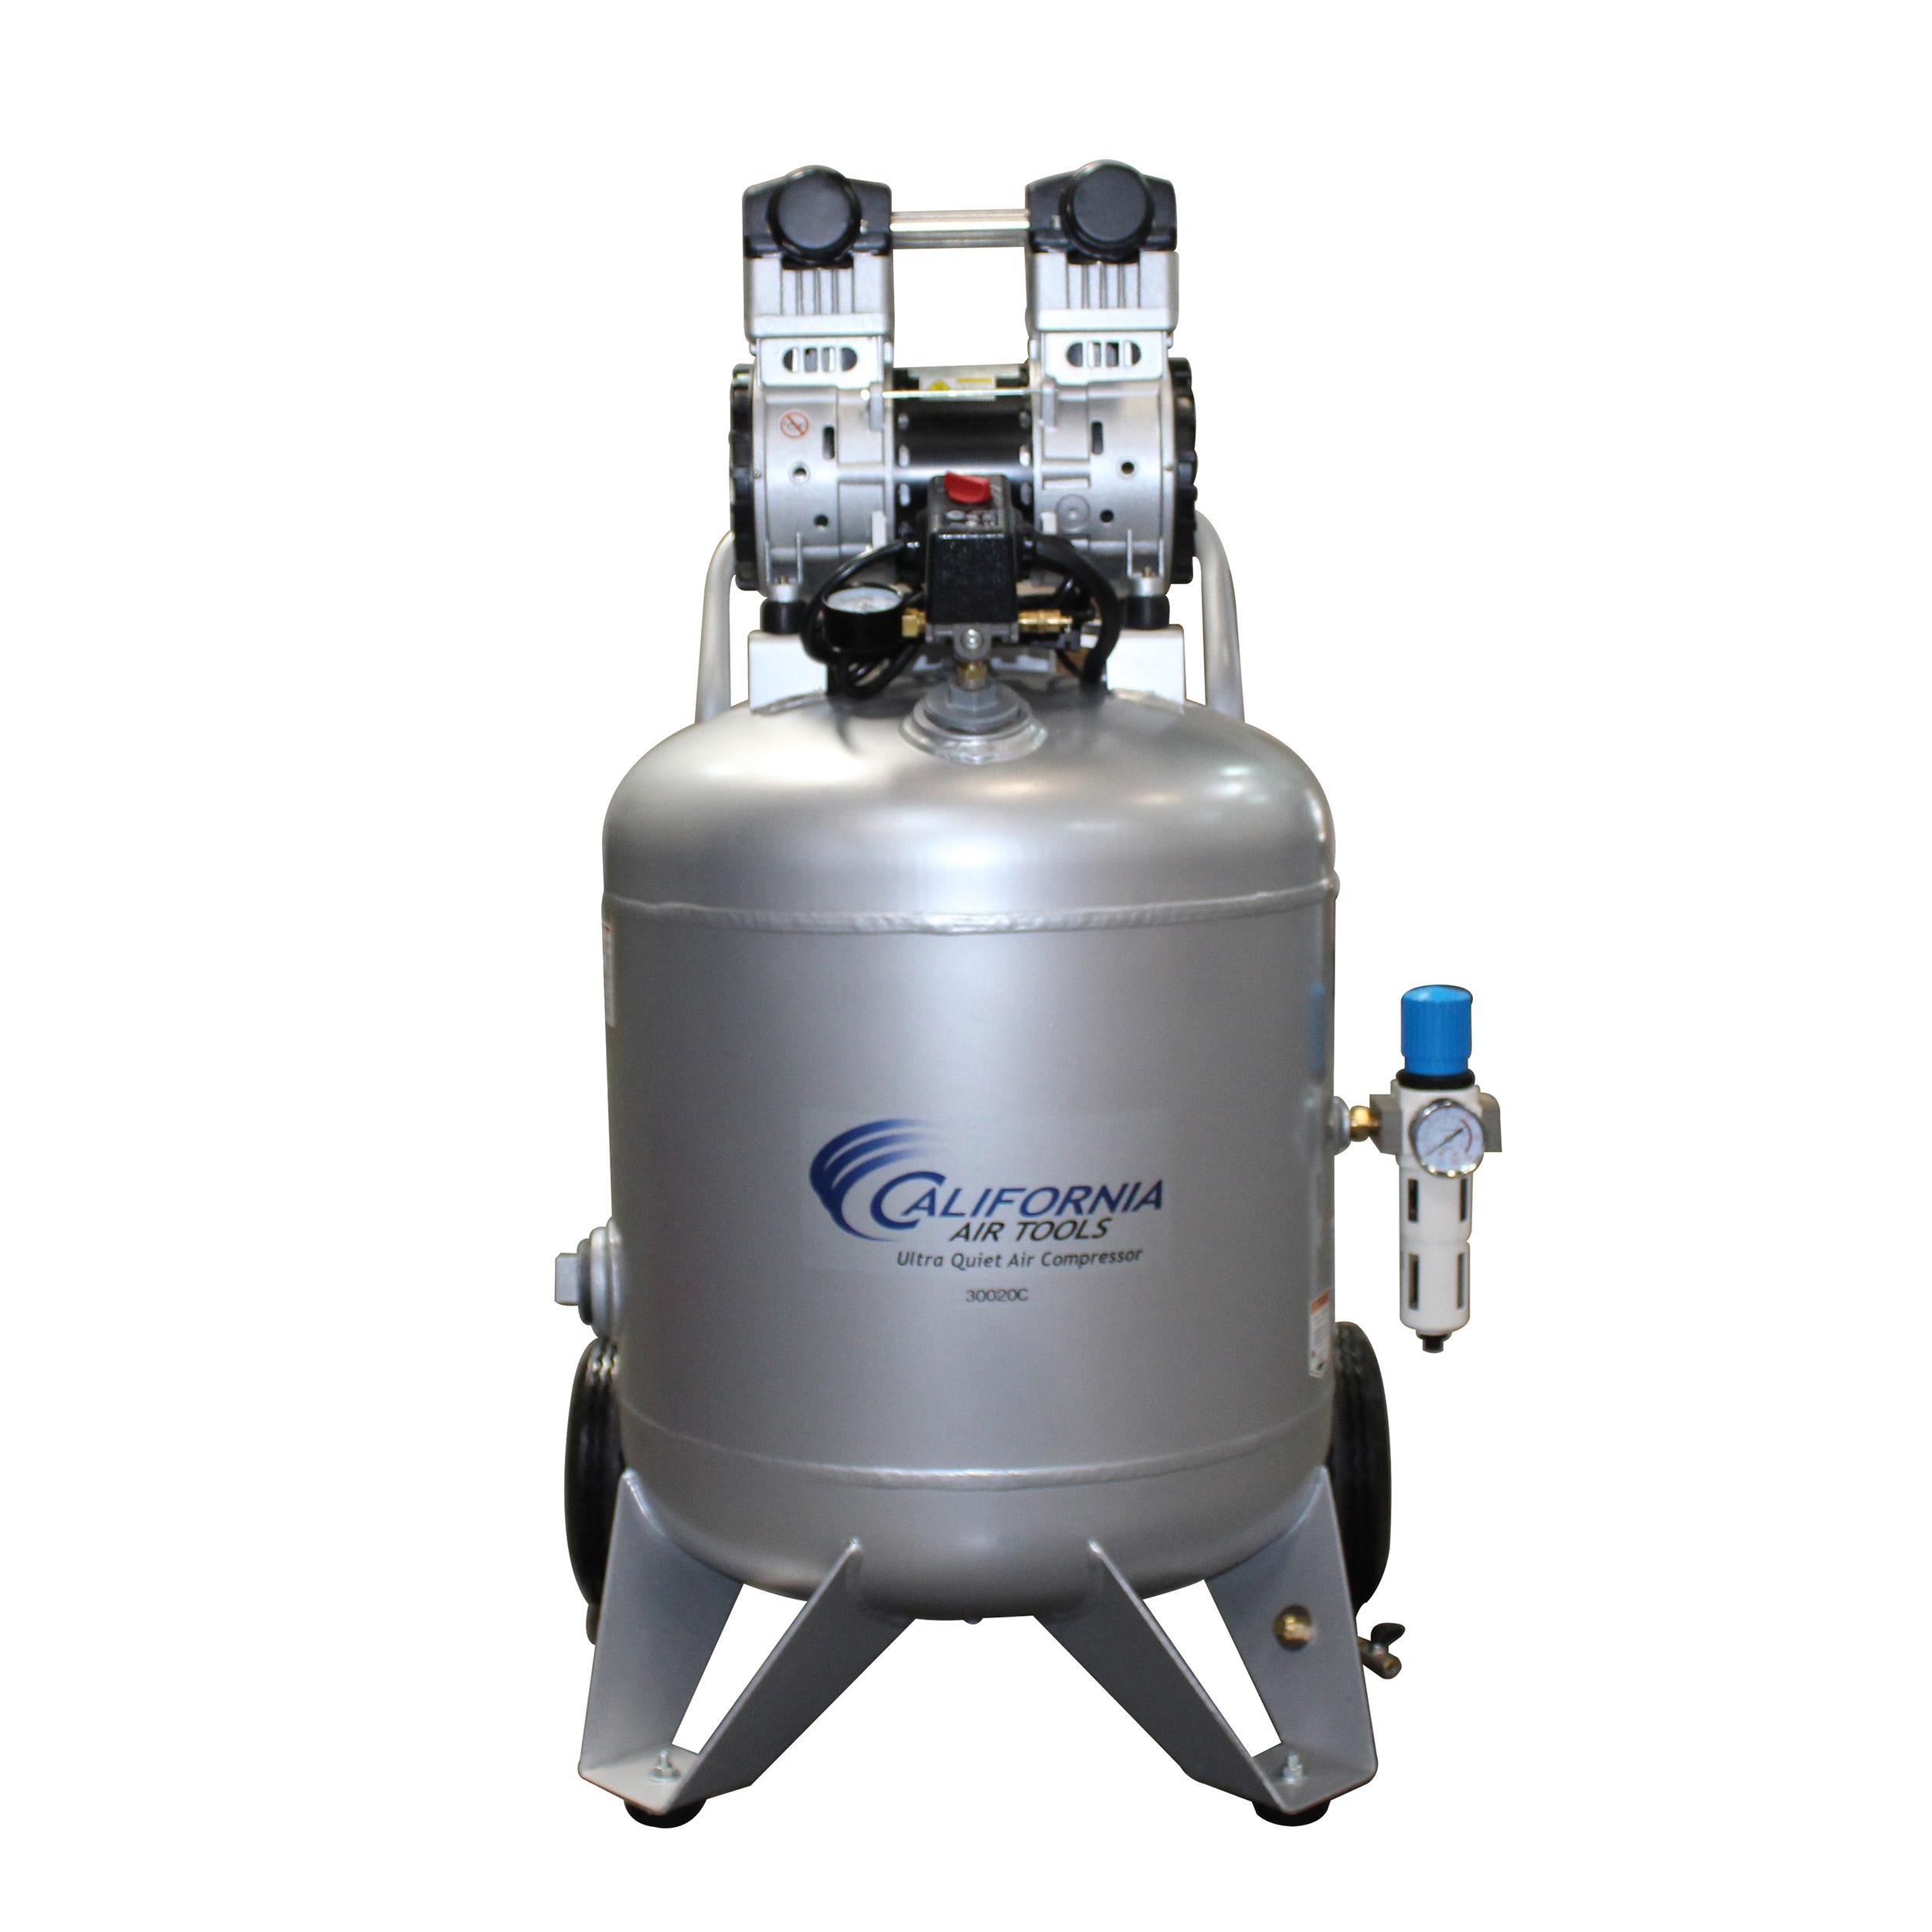 Steel Tank Air Compressor, 30020C-22060, Ultra Quiet  & Oil-Free  2.0 Hp, 30 gallon,  220v 60 hz